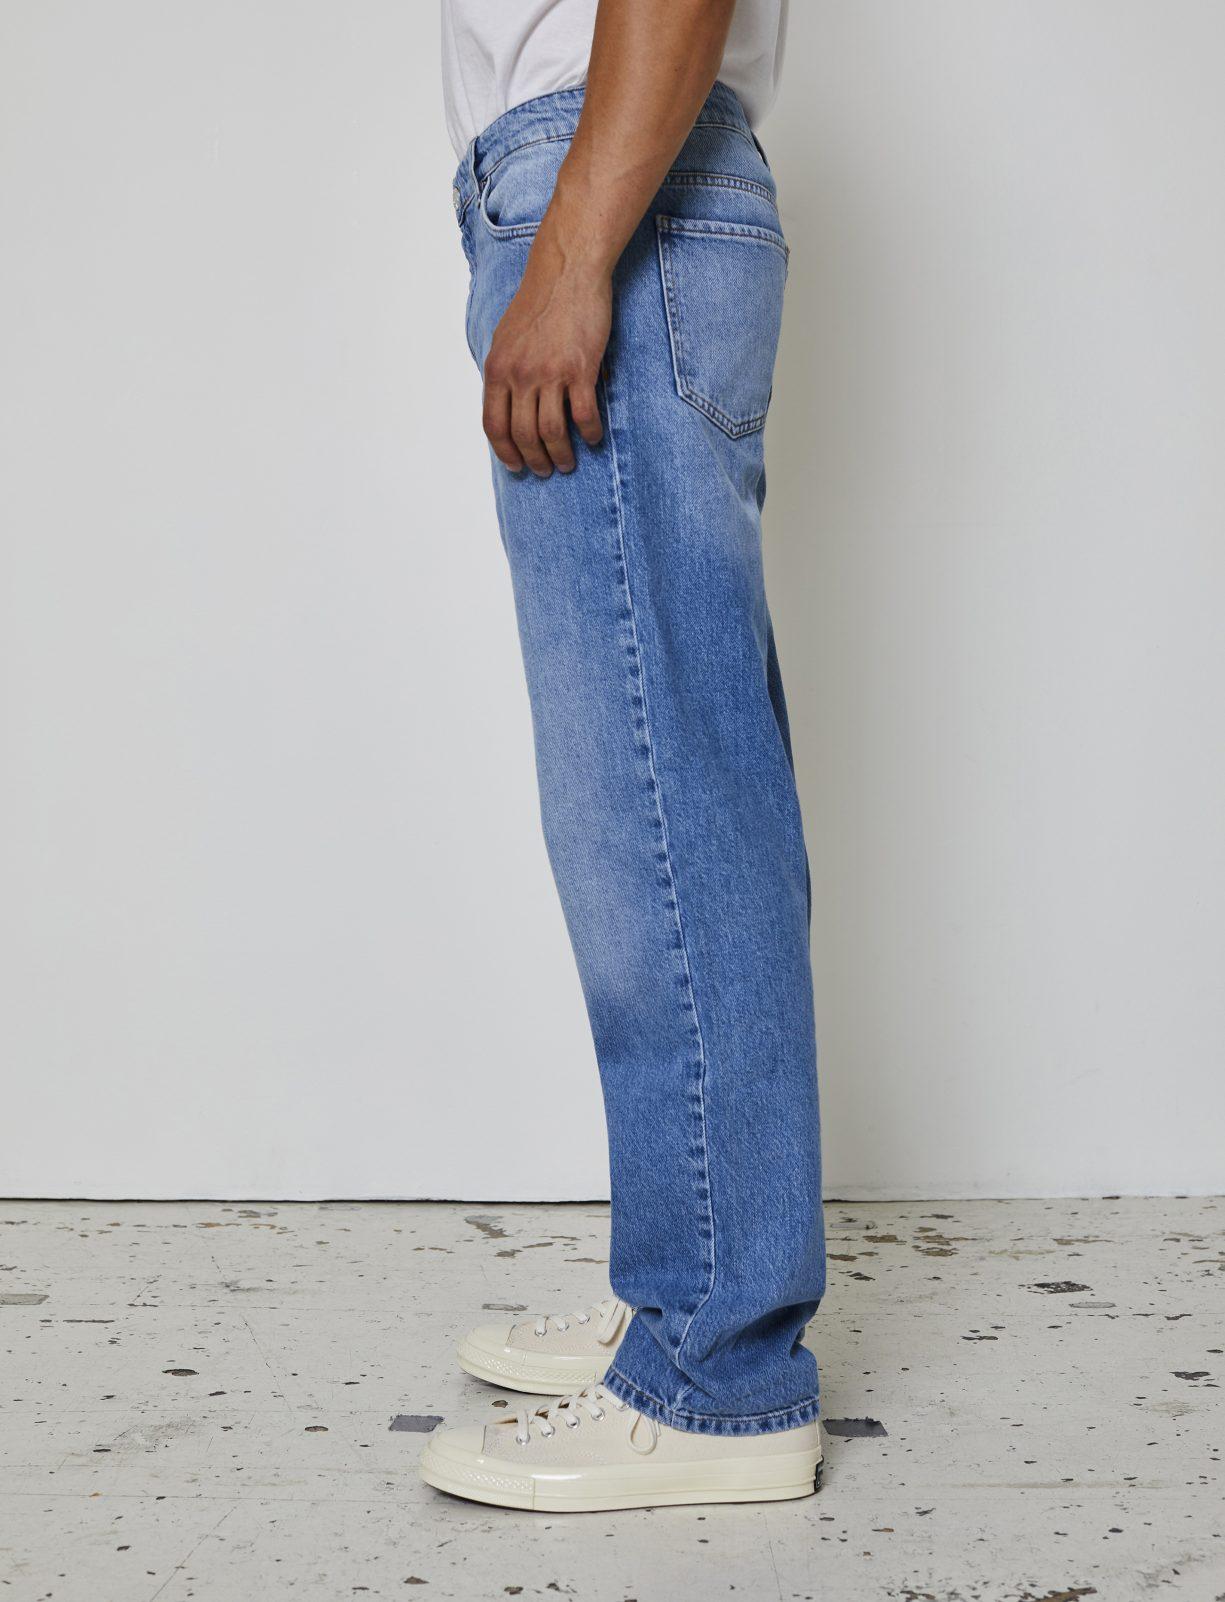 Just junkies Jeans - curtis mondo blue   GATE 36 Hobro